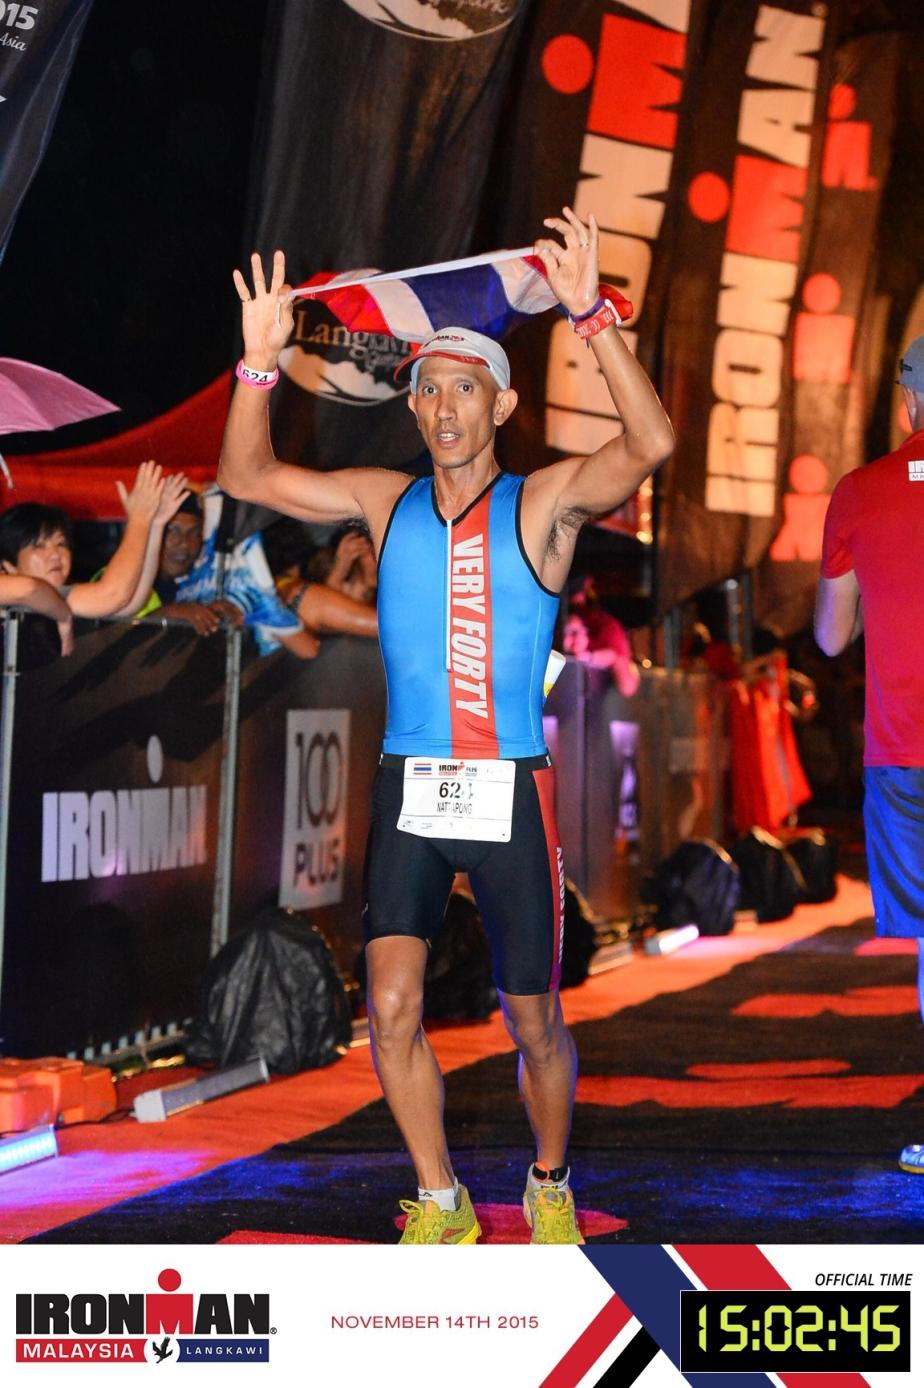 Ironman Langkawi ForZuri Episode II : ไม่หมูแต่ทุกคนทำได้